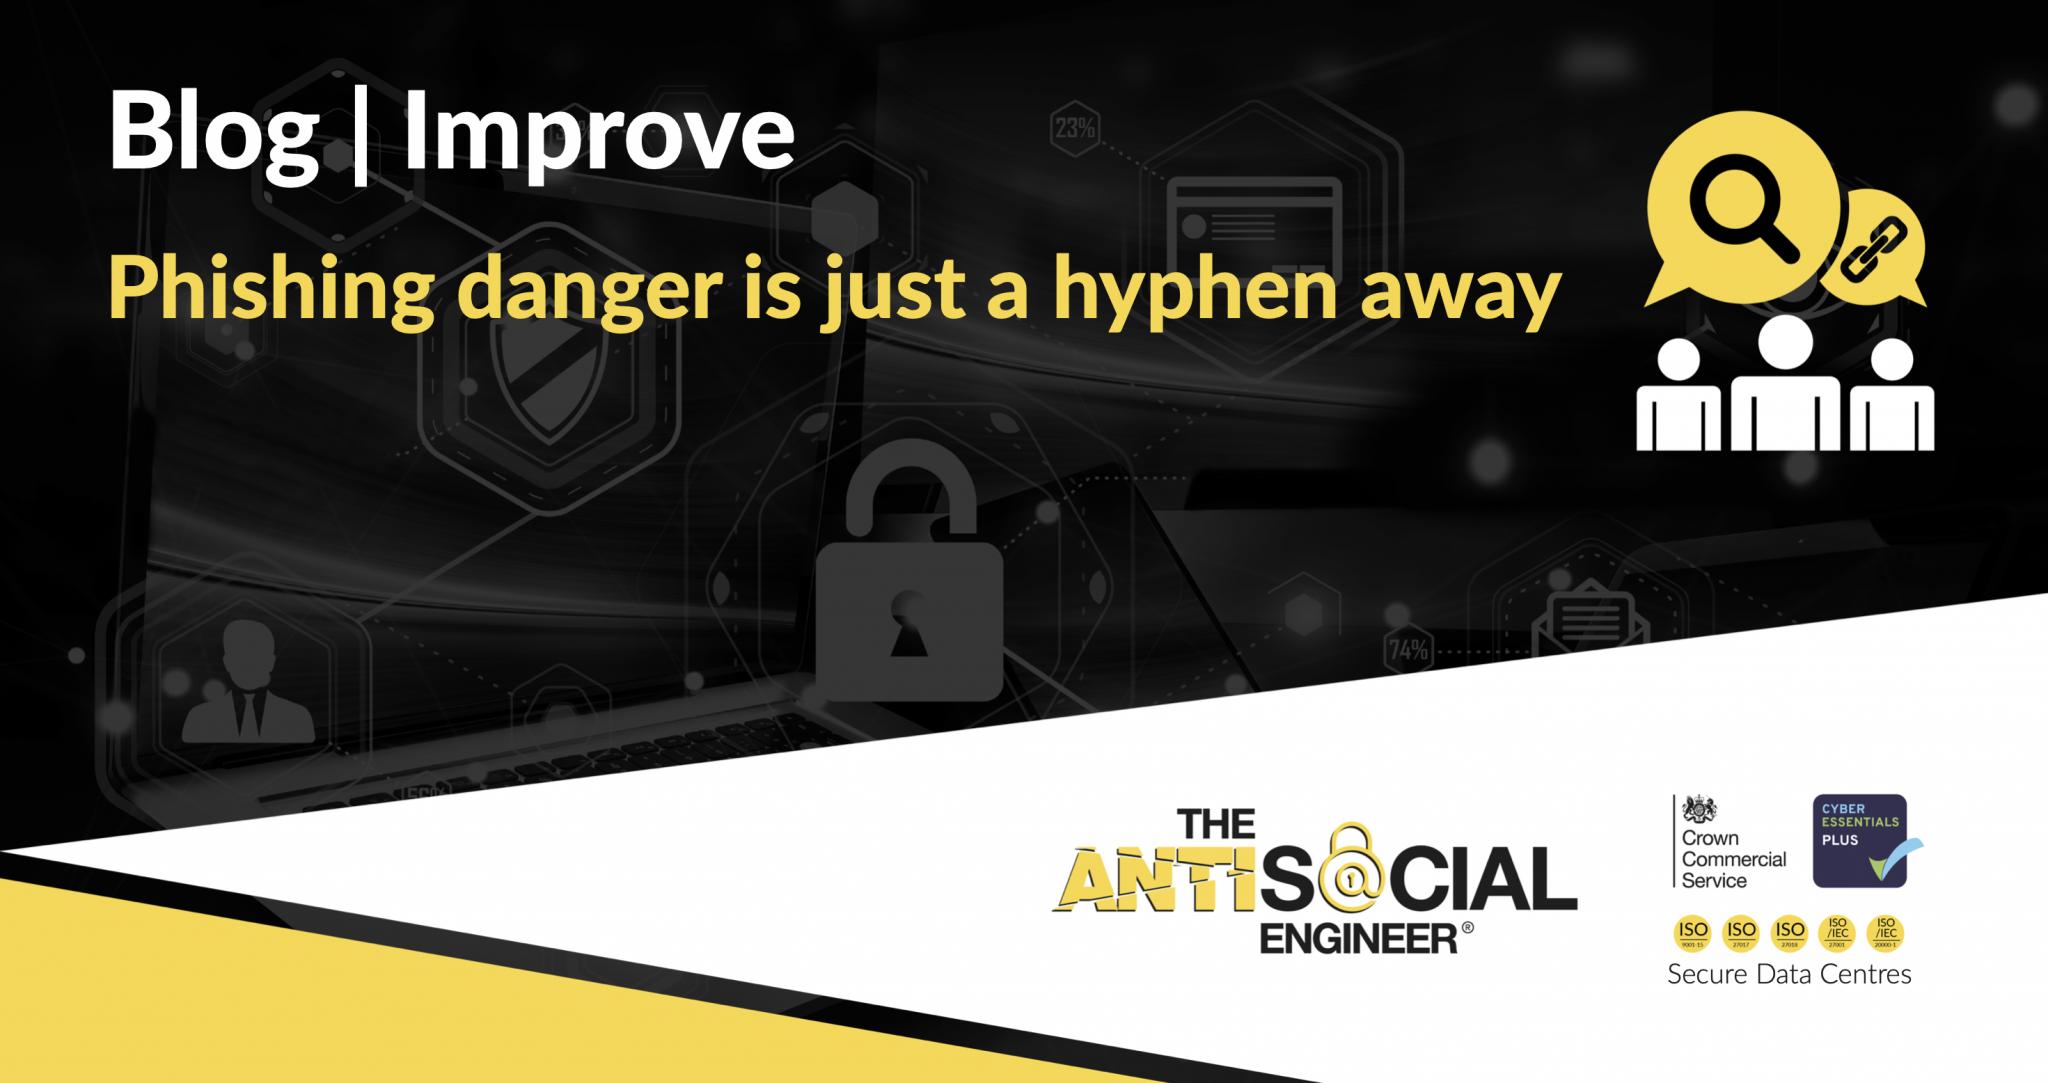 Phishing danger is just a hyphen away.